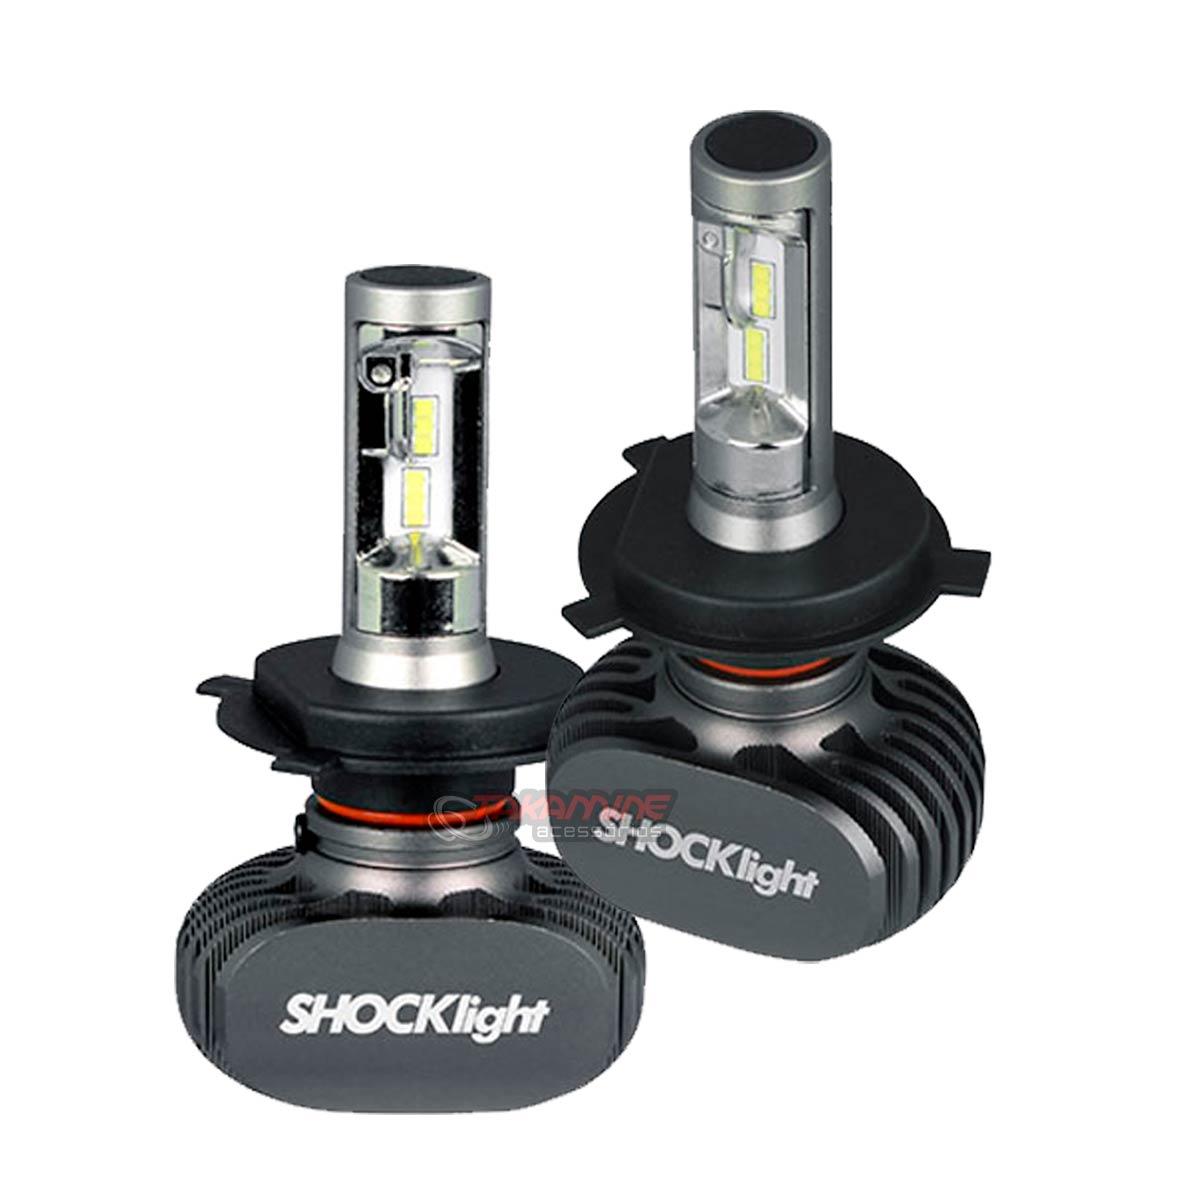 Kit Ultra LED Logan 2007 2008 2009 2010 2011 2012 2013 tipo xenon farol alto e baixo H4 50W